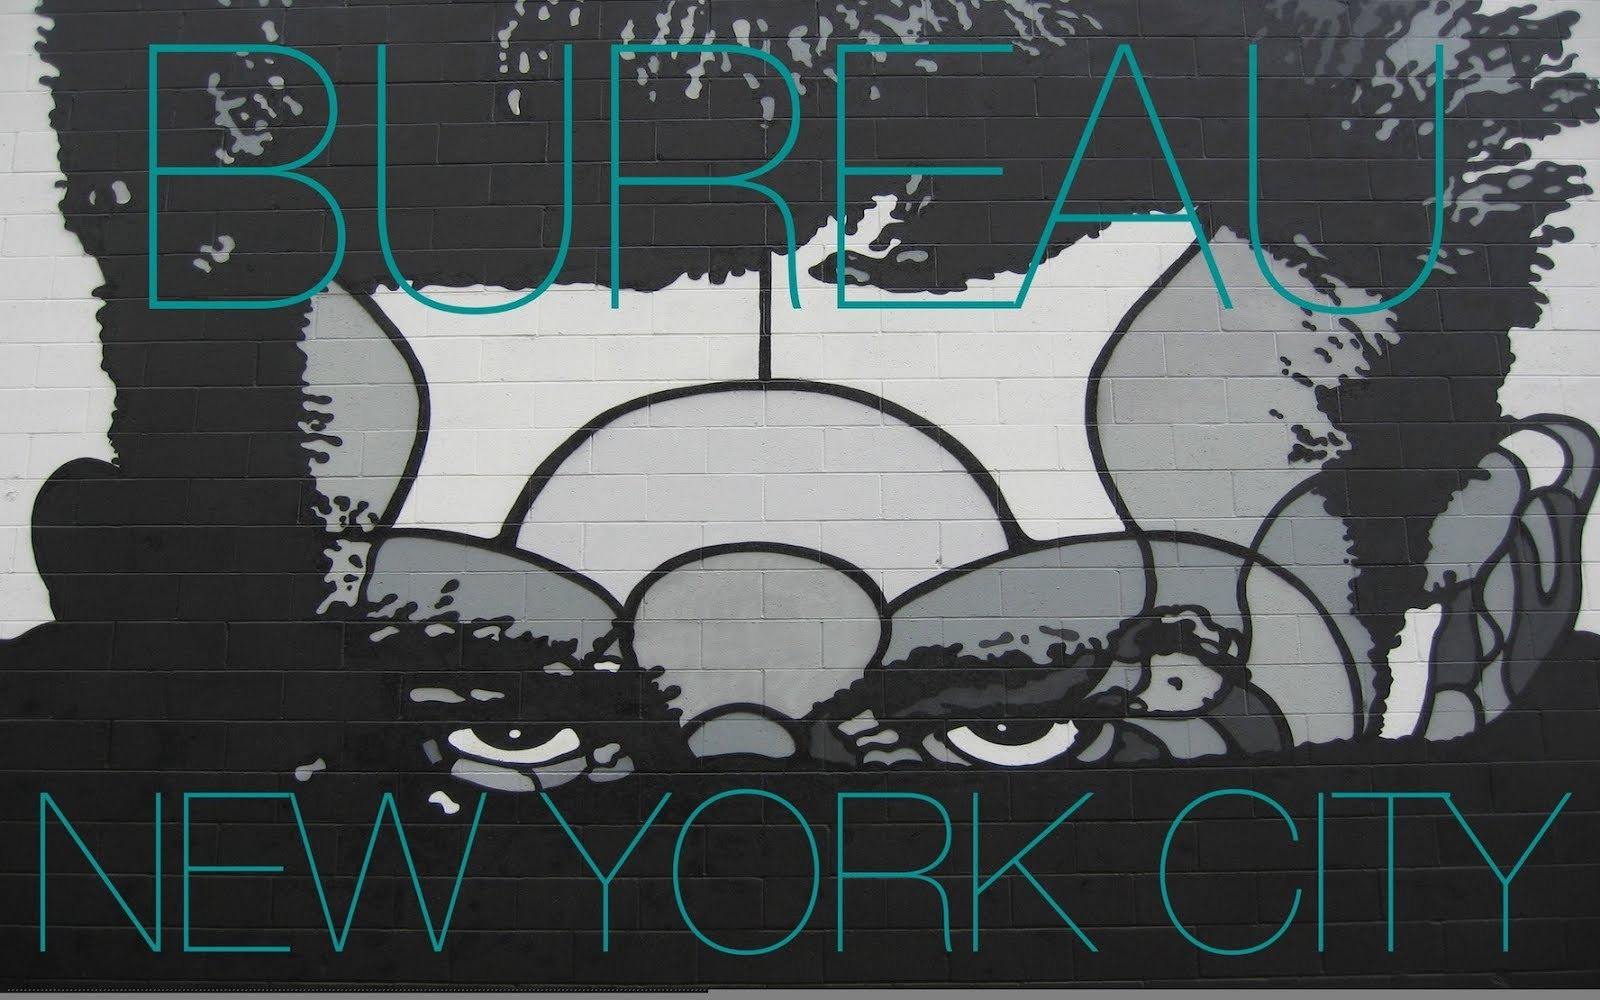 VISIT BUREAU NEW YORK